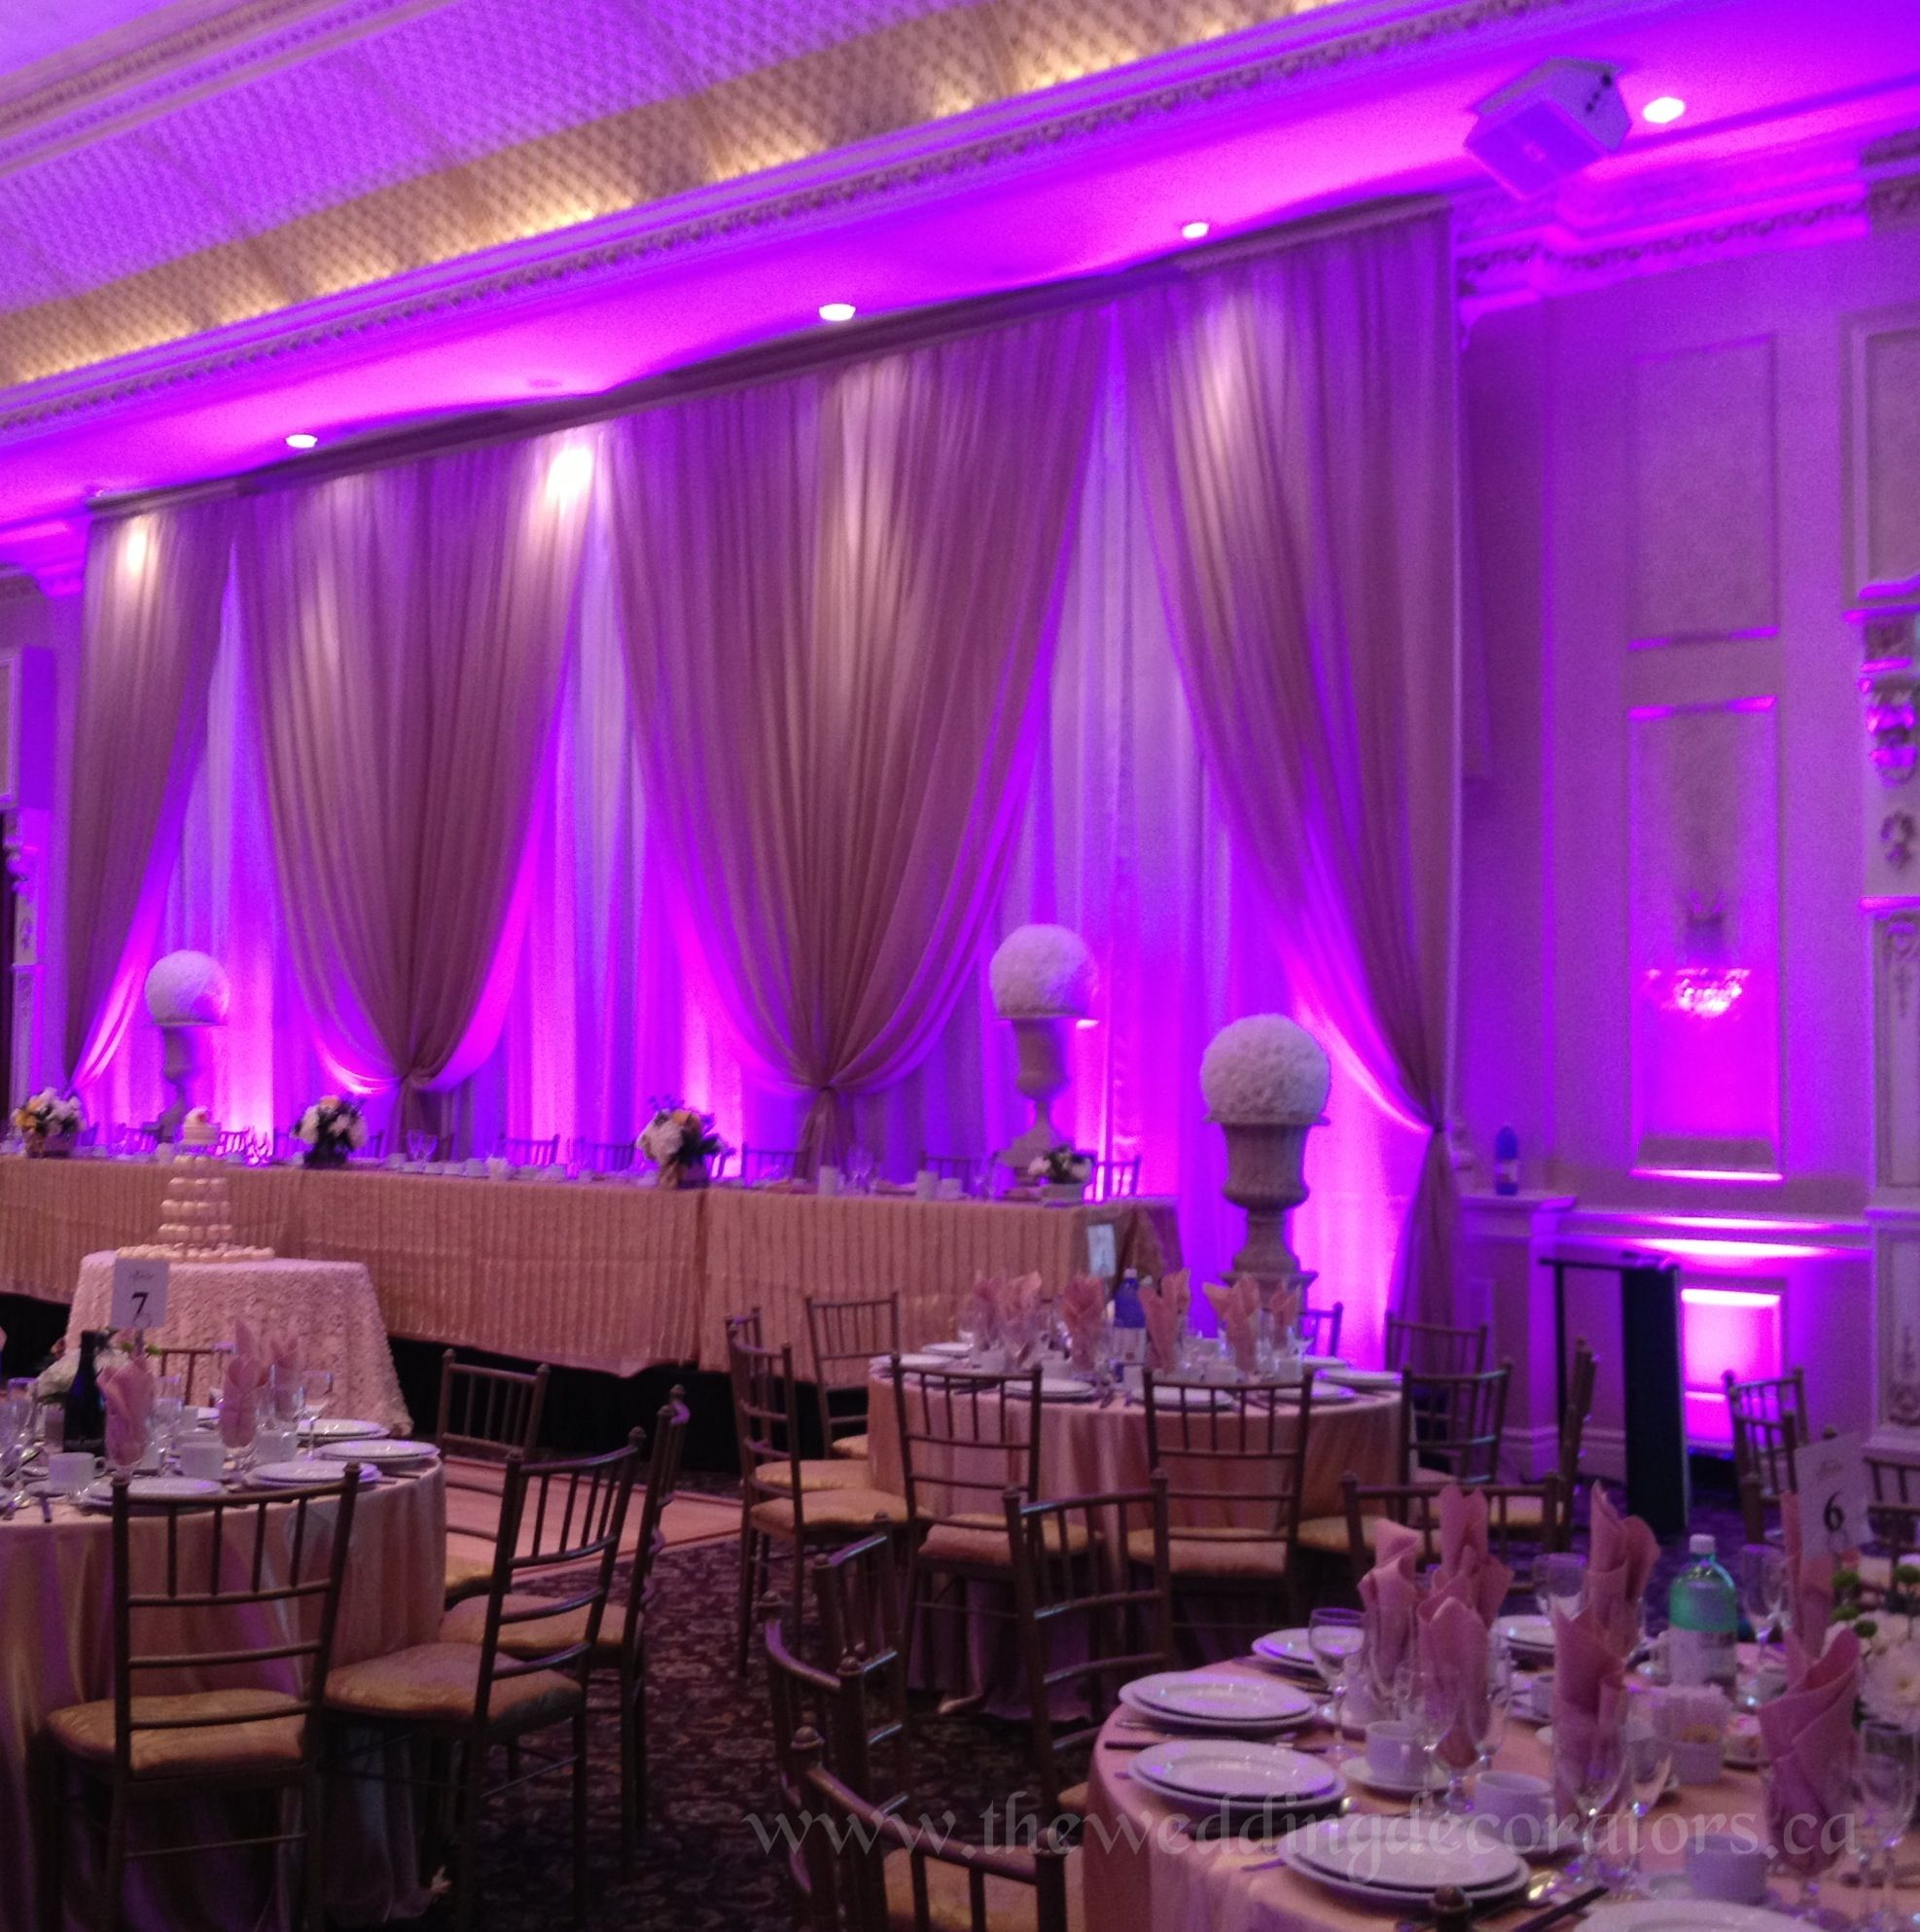 Wedding backdrop with elegant LED lighting. | Ideas for L ...